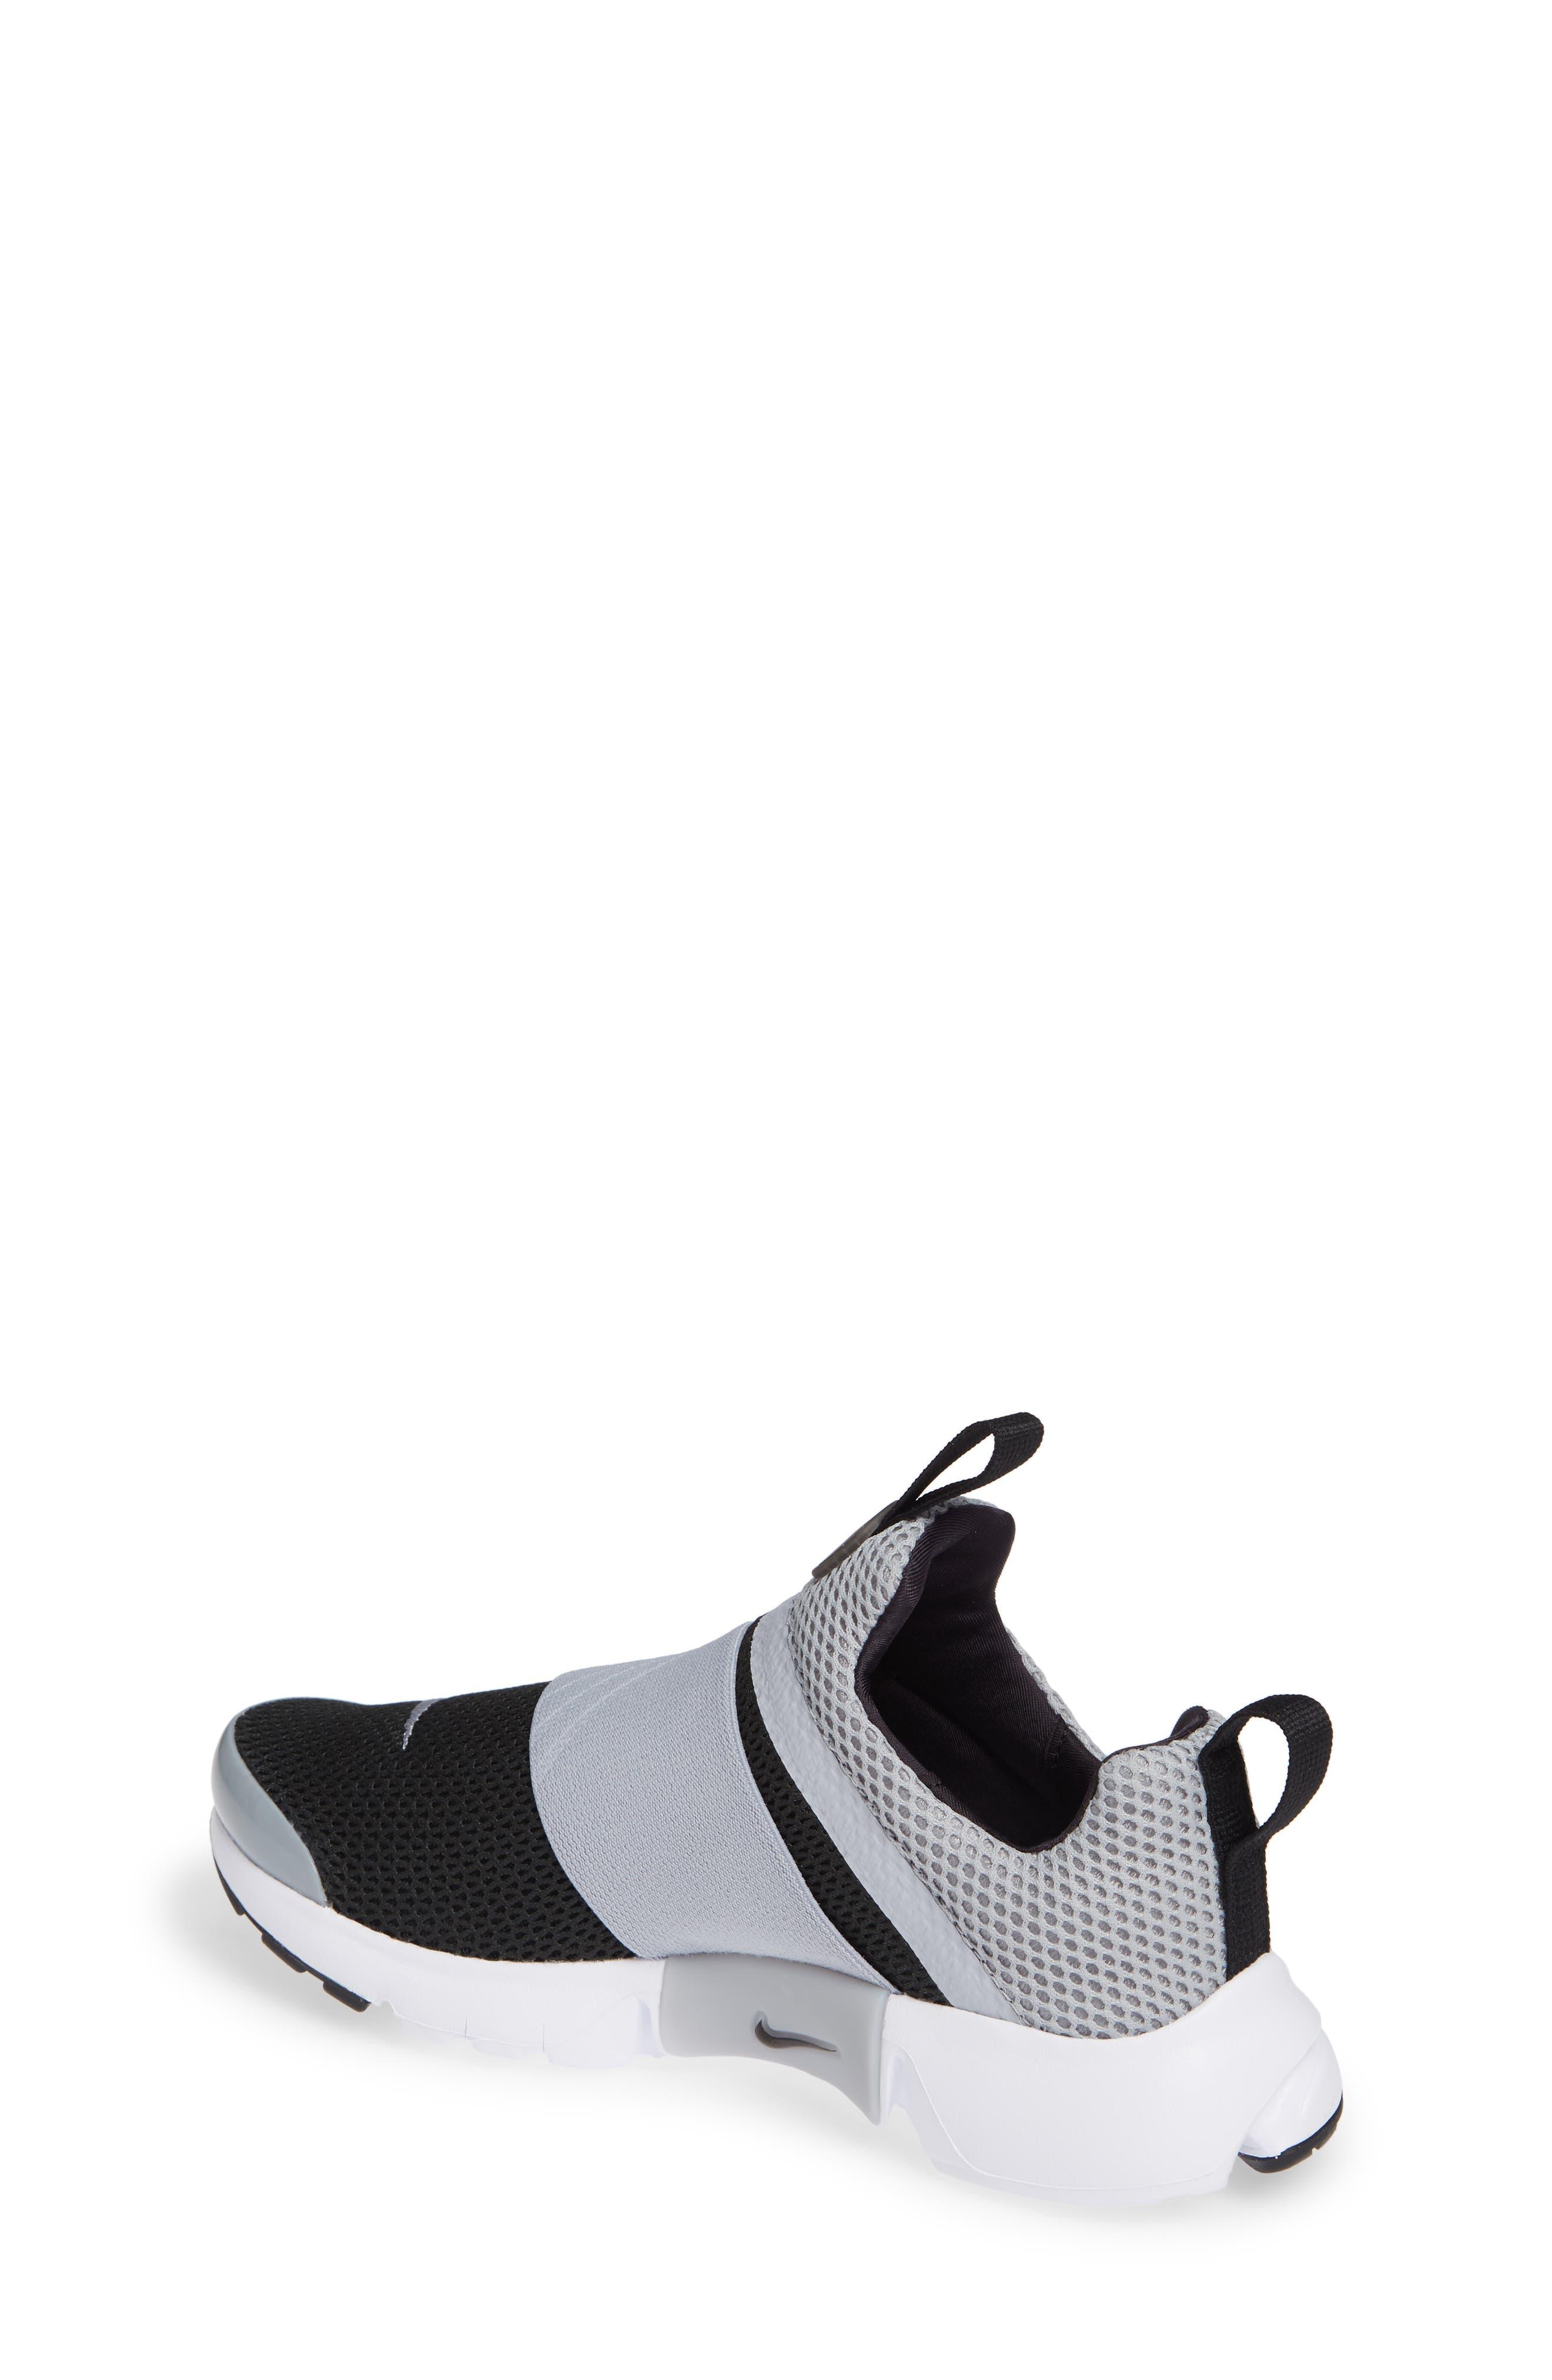 Presto Extreme Sneaker,                             Alternate thumbnail 14, color,